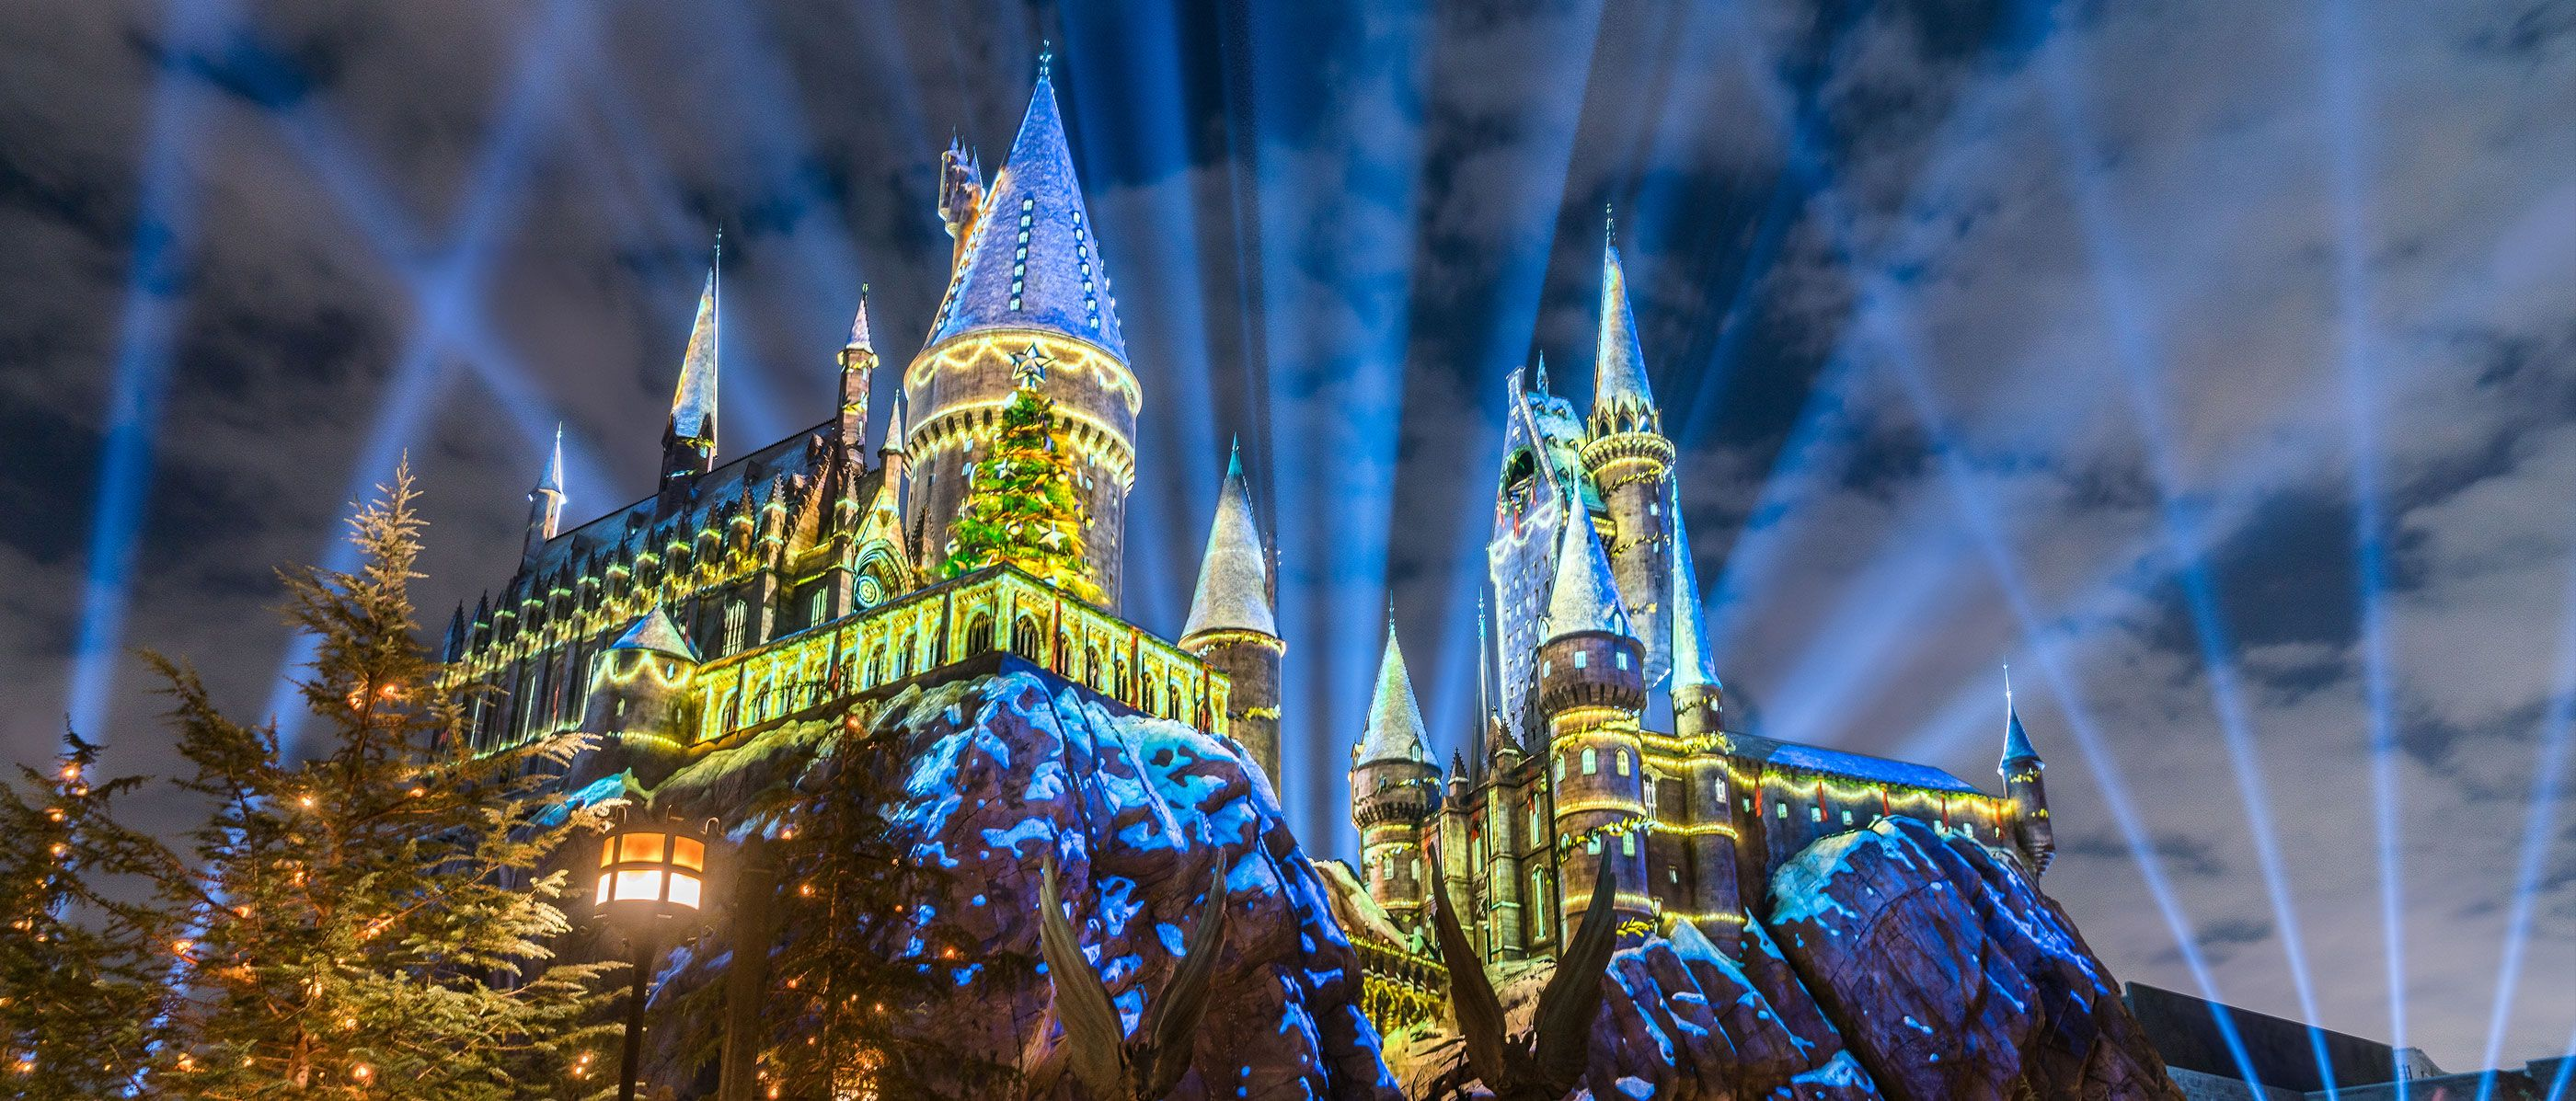 Done Visit The Wizarding World Of Harry Potter For Christmas Someday Maybe Honeymoon Hogwarts Christmas Orlando Holiday Universal Orlando